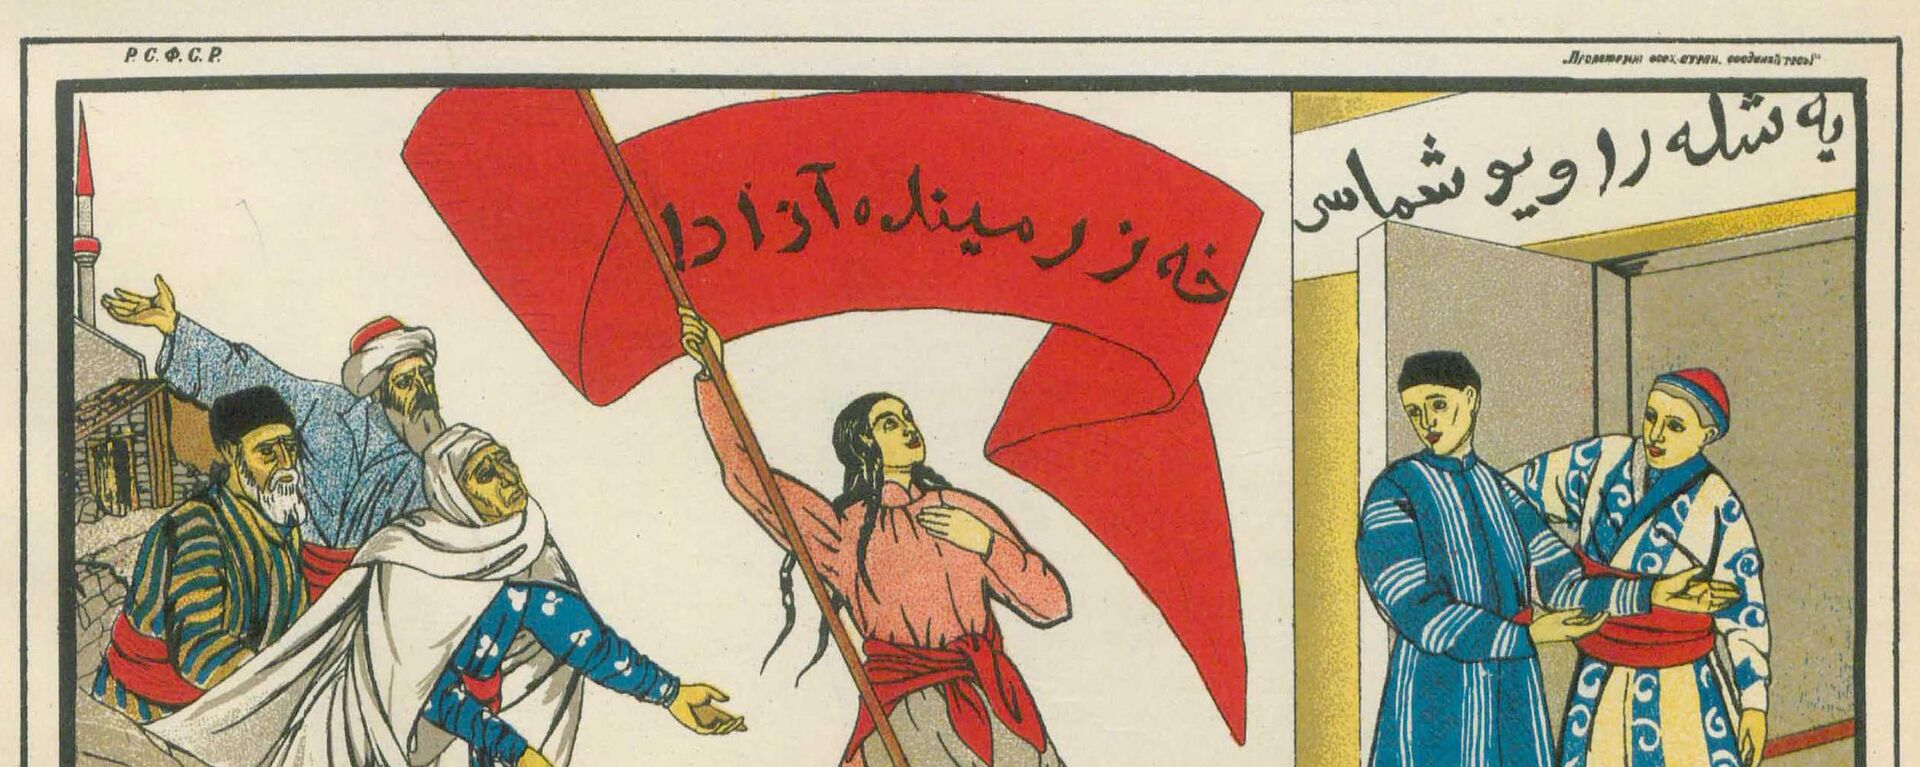 Плакат «Я сейчас тоже свободна!». Москва, 1921 год - Sputnik Таджикистан, 1920, 03.11.2020